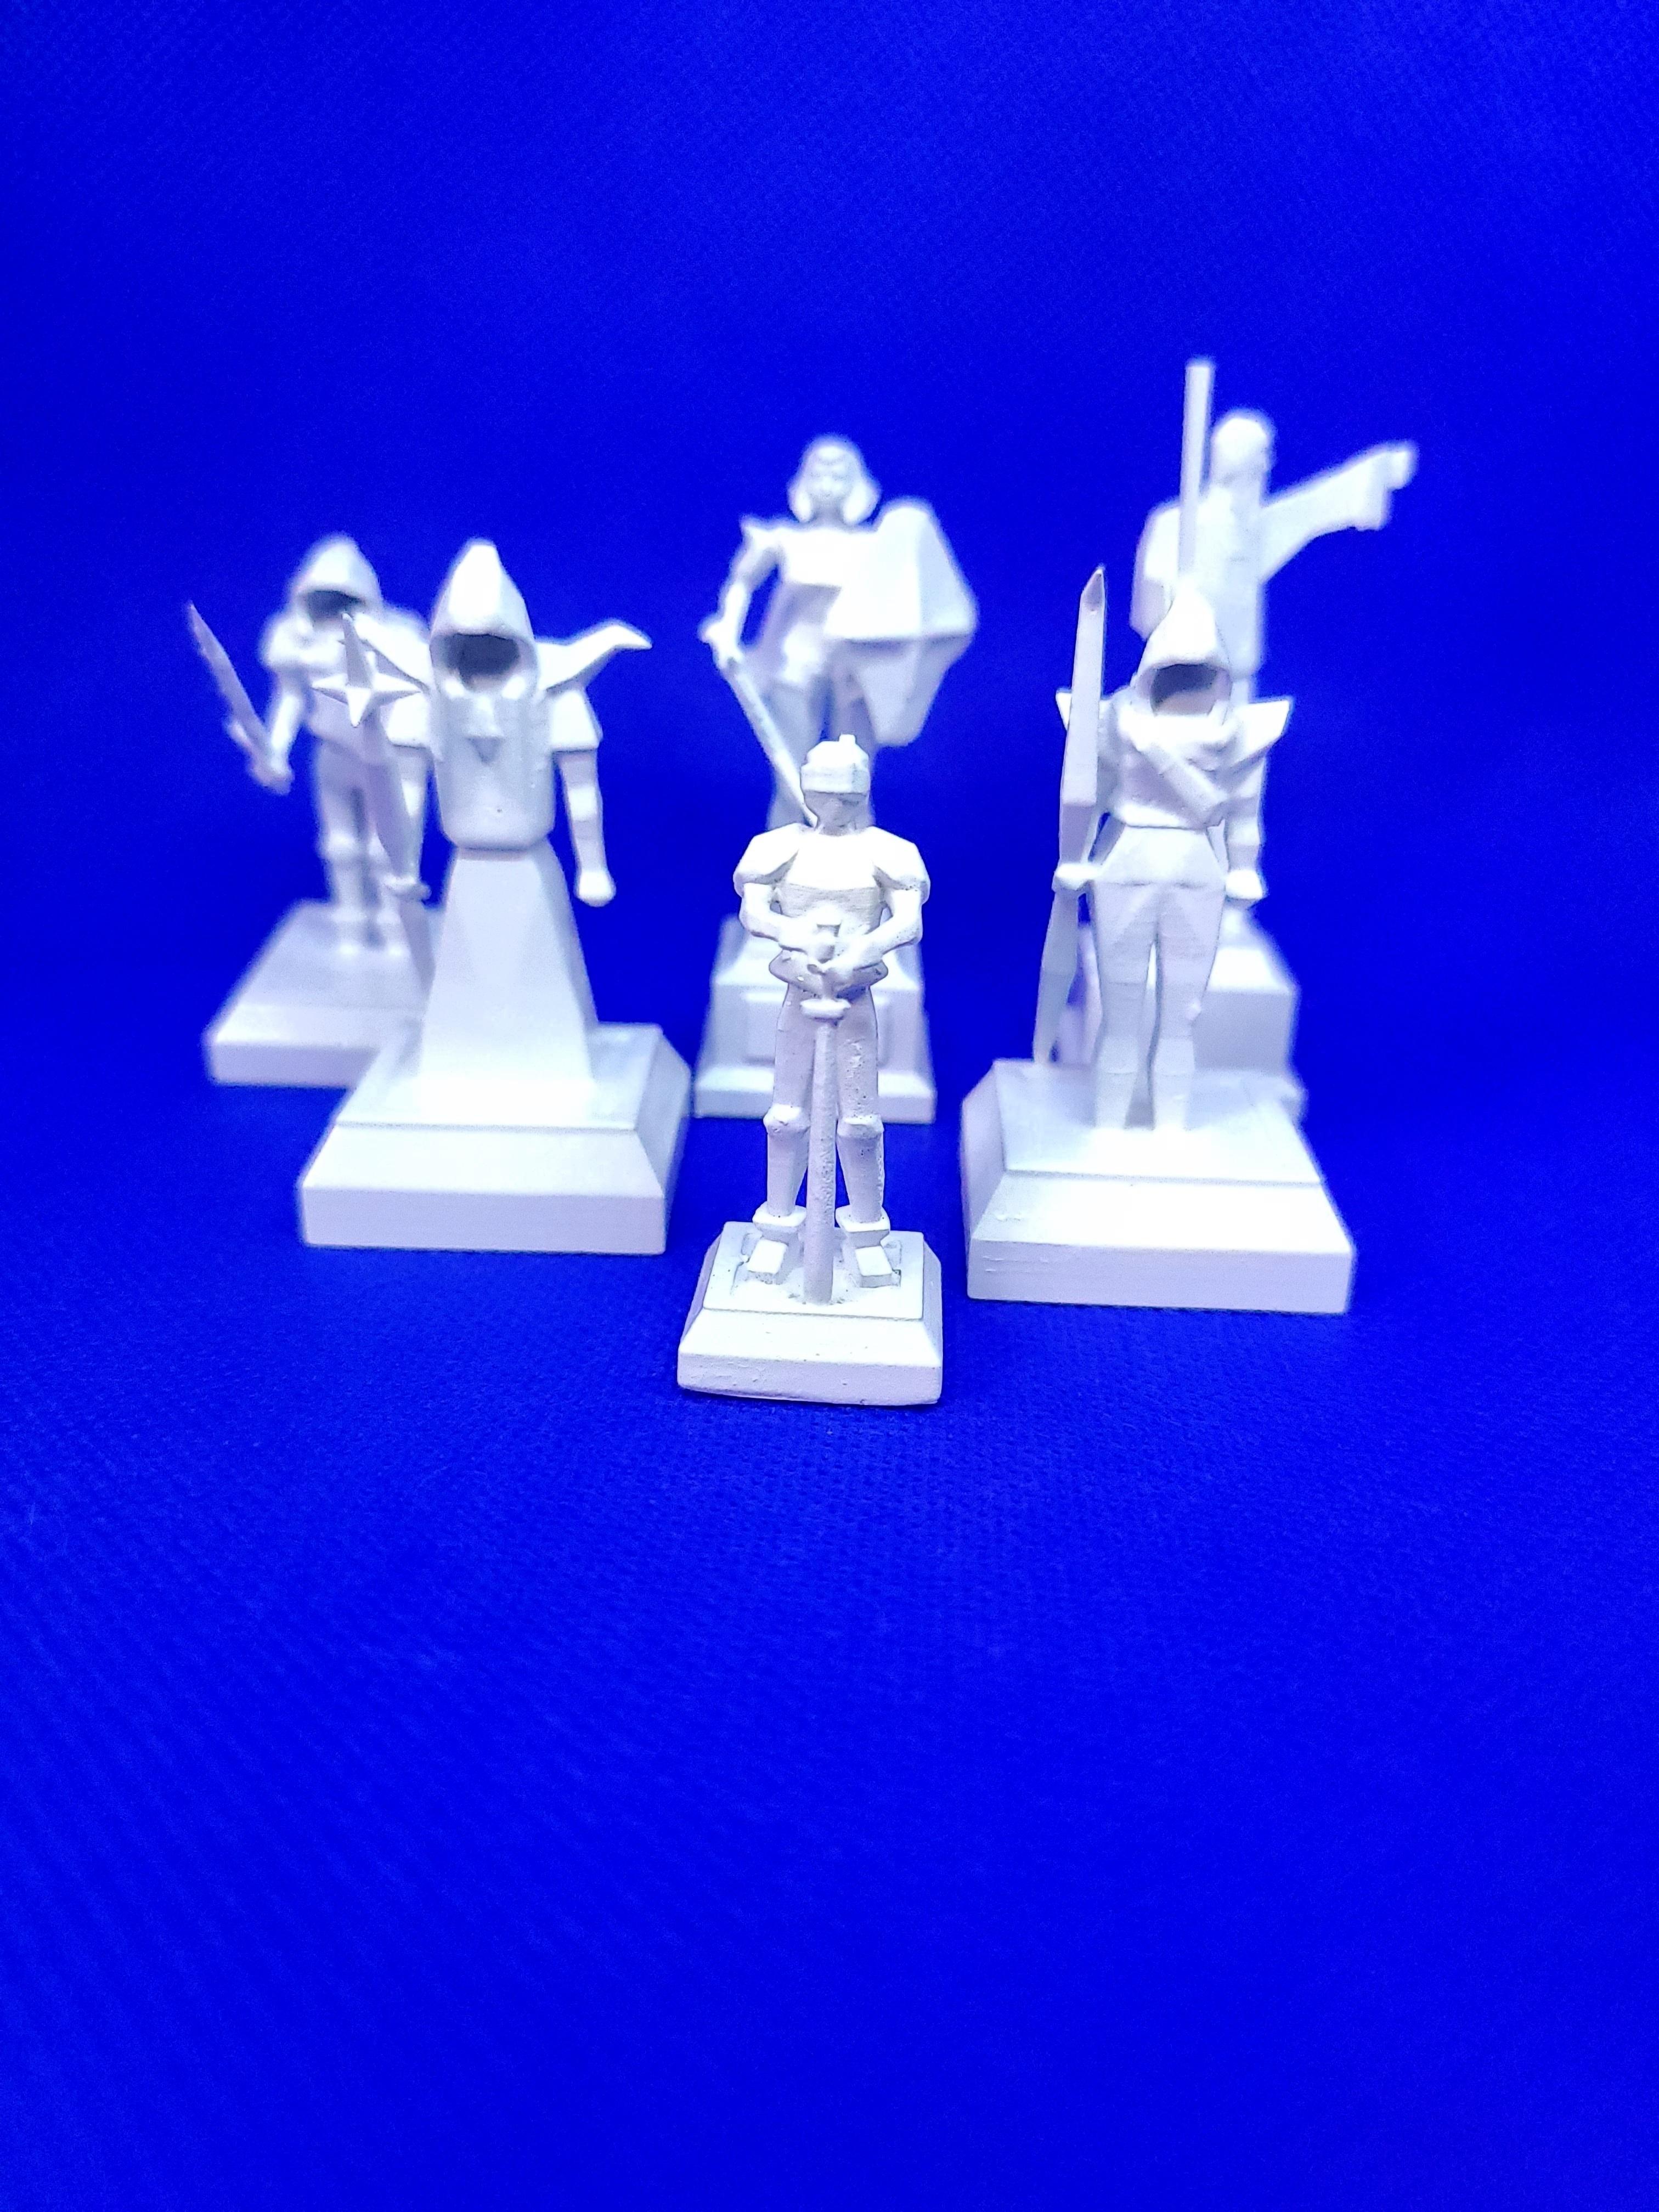 20201015_182345 - Copy.jpg Download STL file OSRS Chess Set Old School Runescape Mini Figures  • Model to 3D print, Wychu